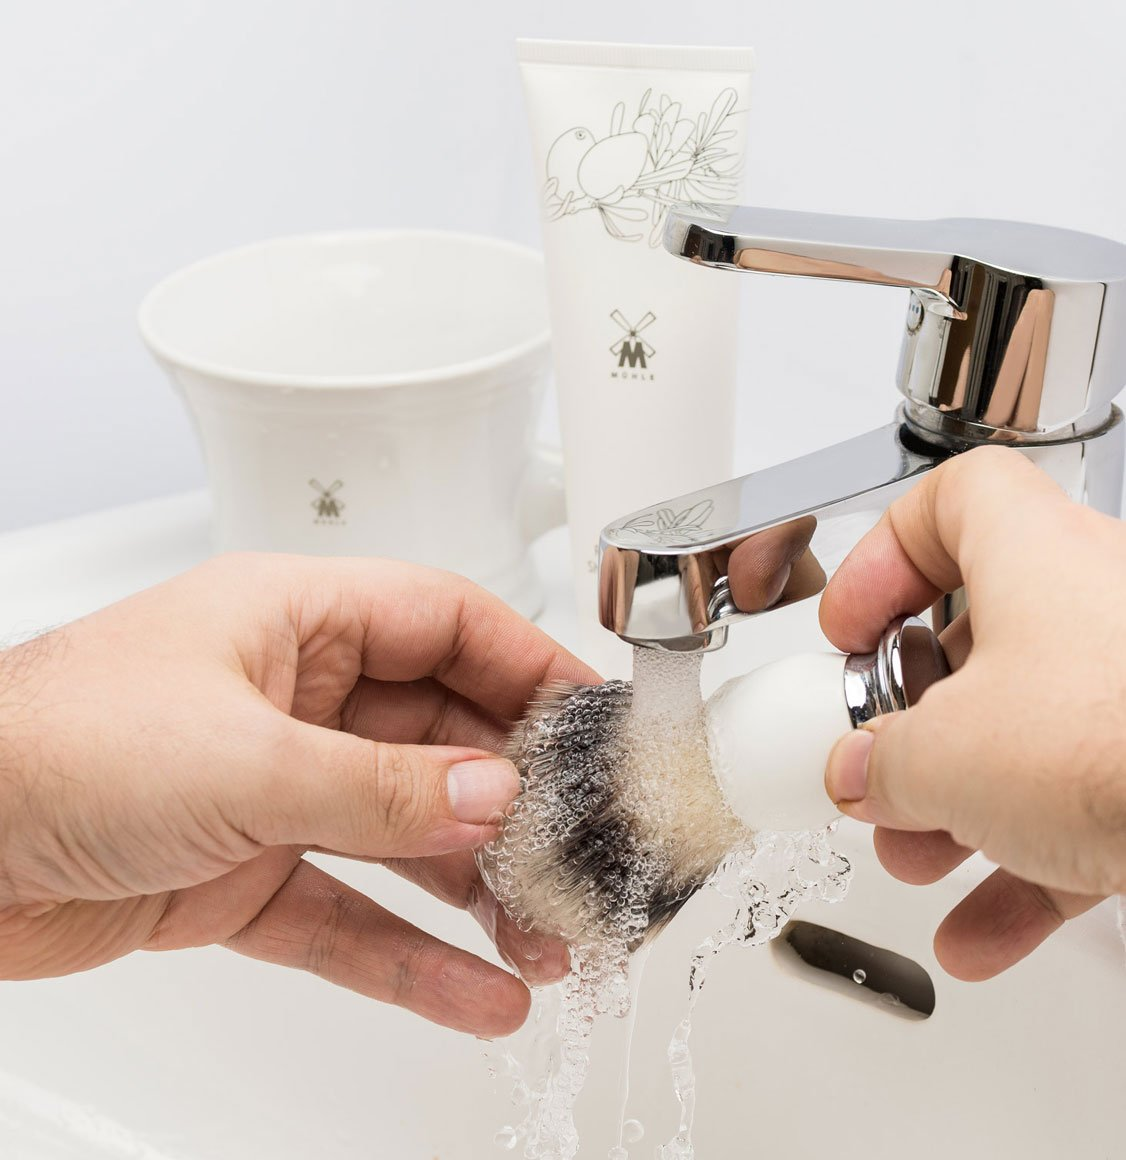 Muhle Porcelain Shaving Mug